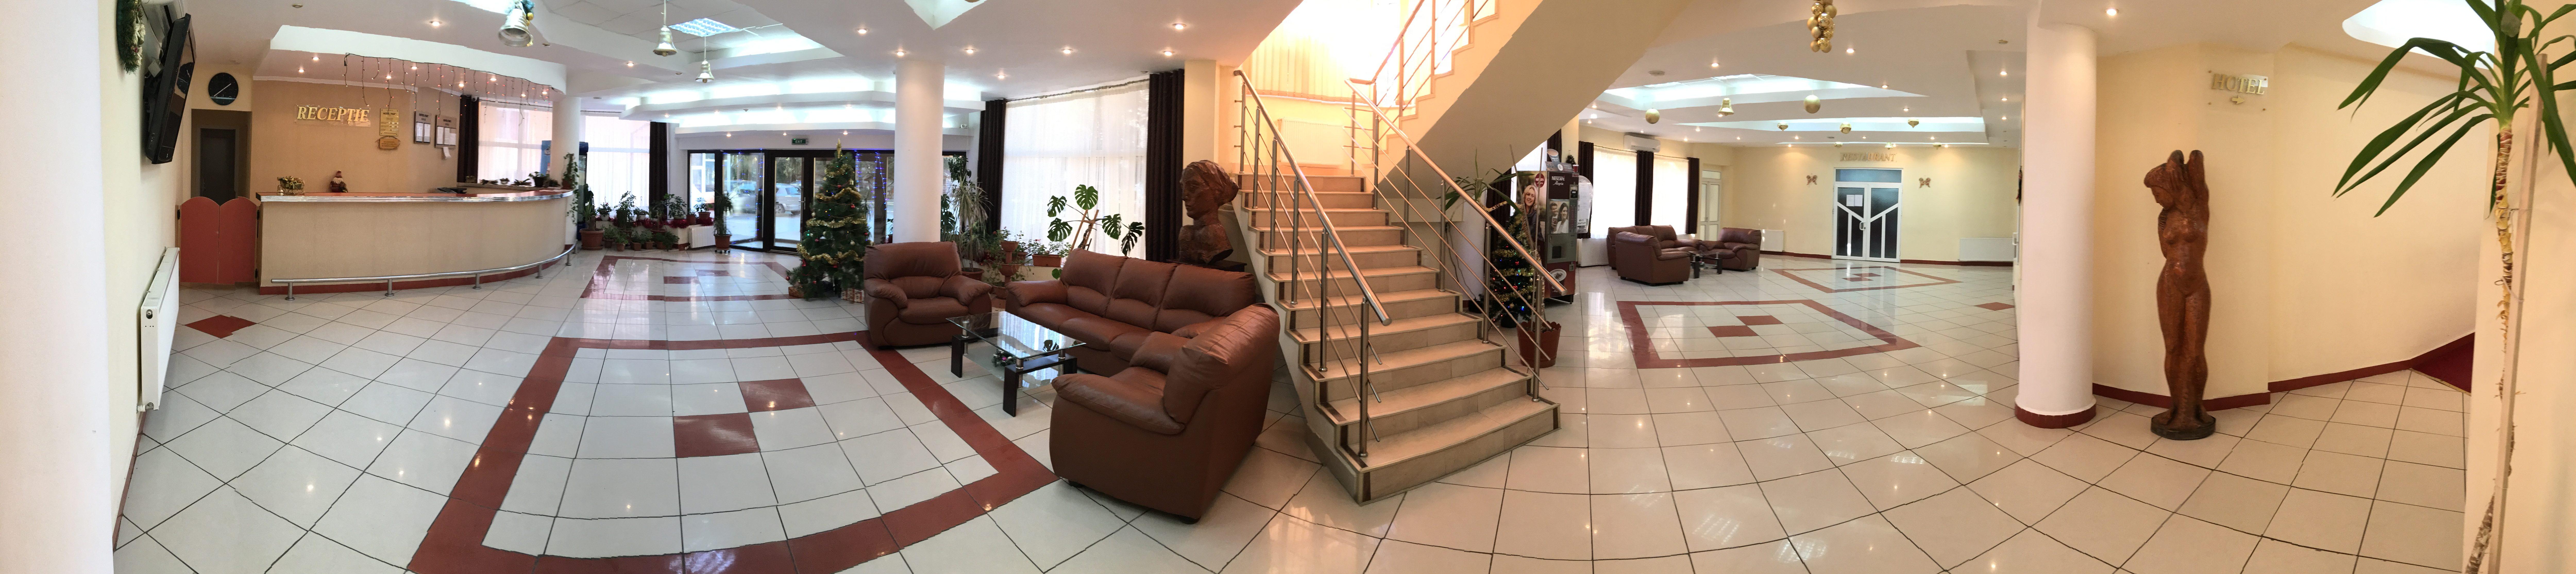 Hotel Parc Amara 2